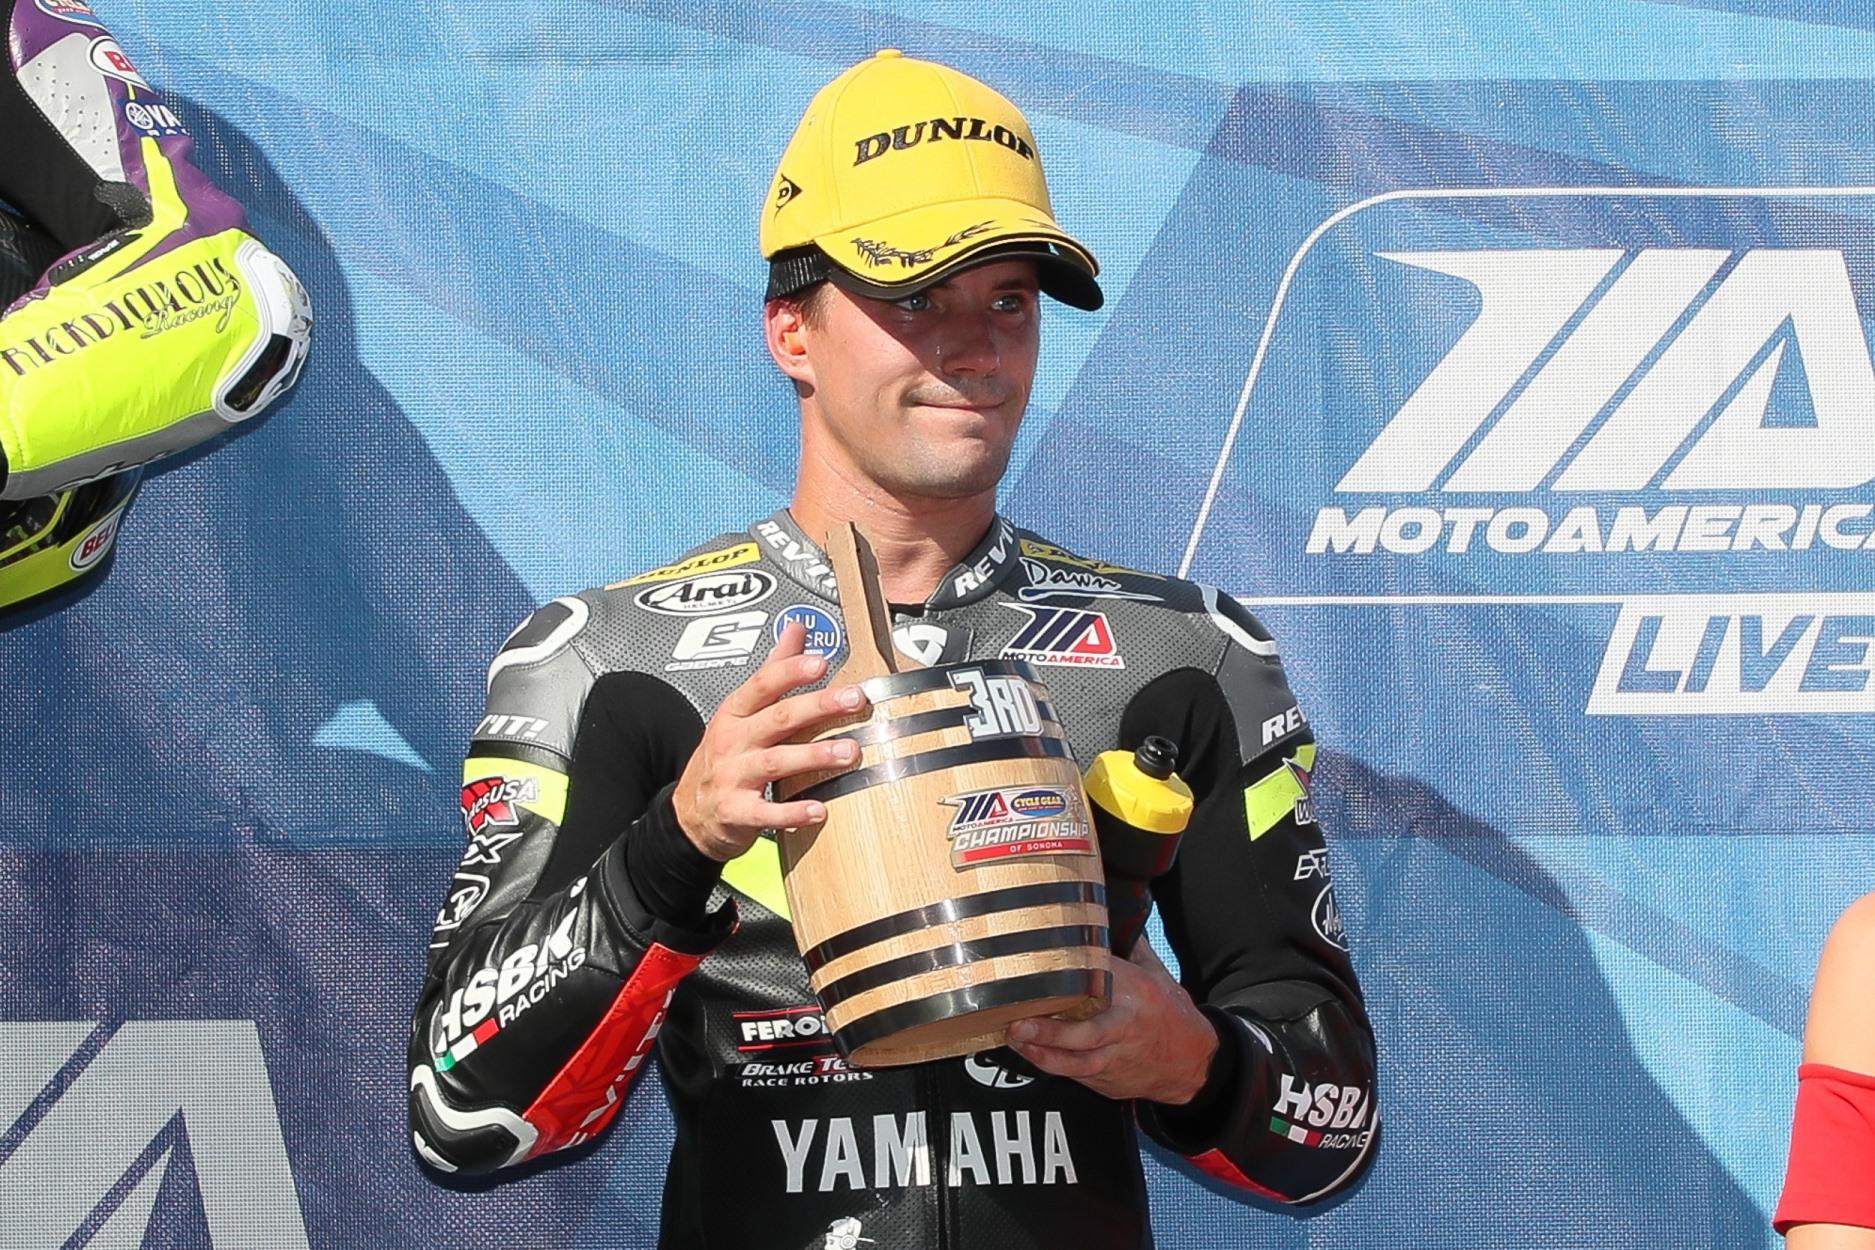 Racing News :: Video: 2019 MotoAmerica Sonoma Raceway Celtic